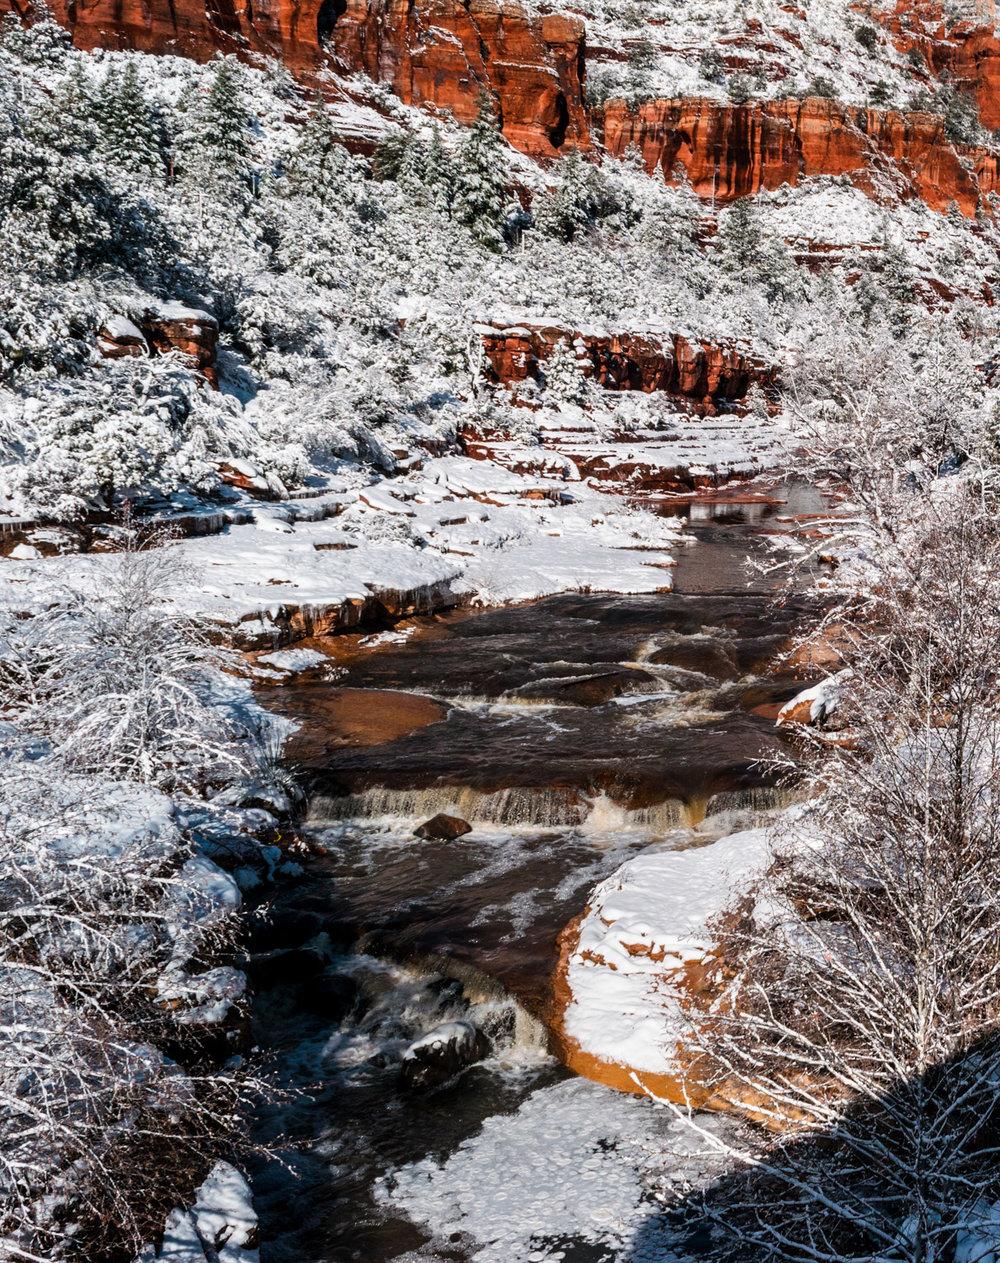 amaris-woo-photography-sedona-arizona